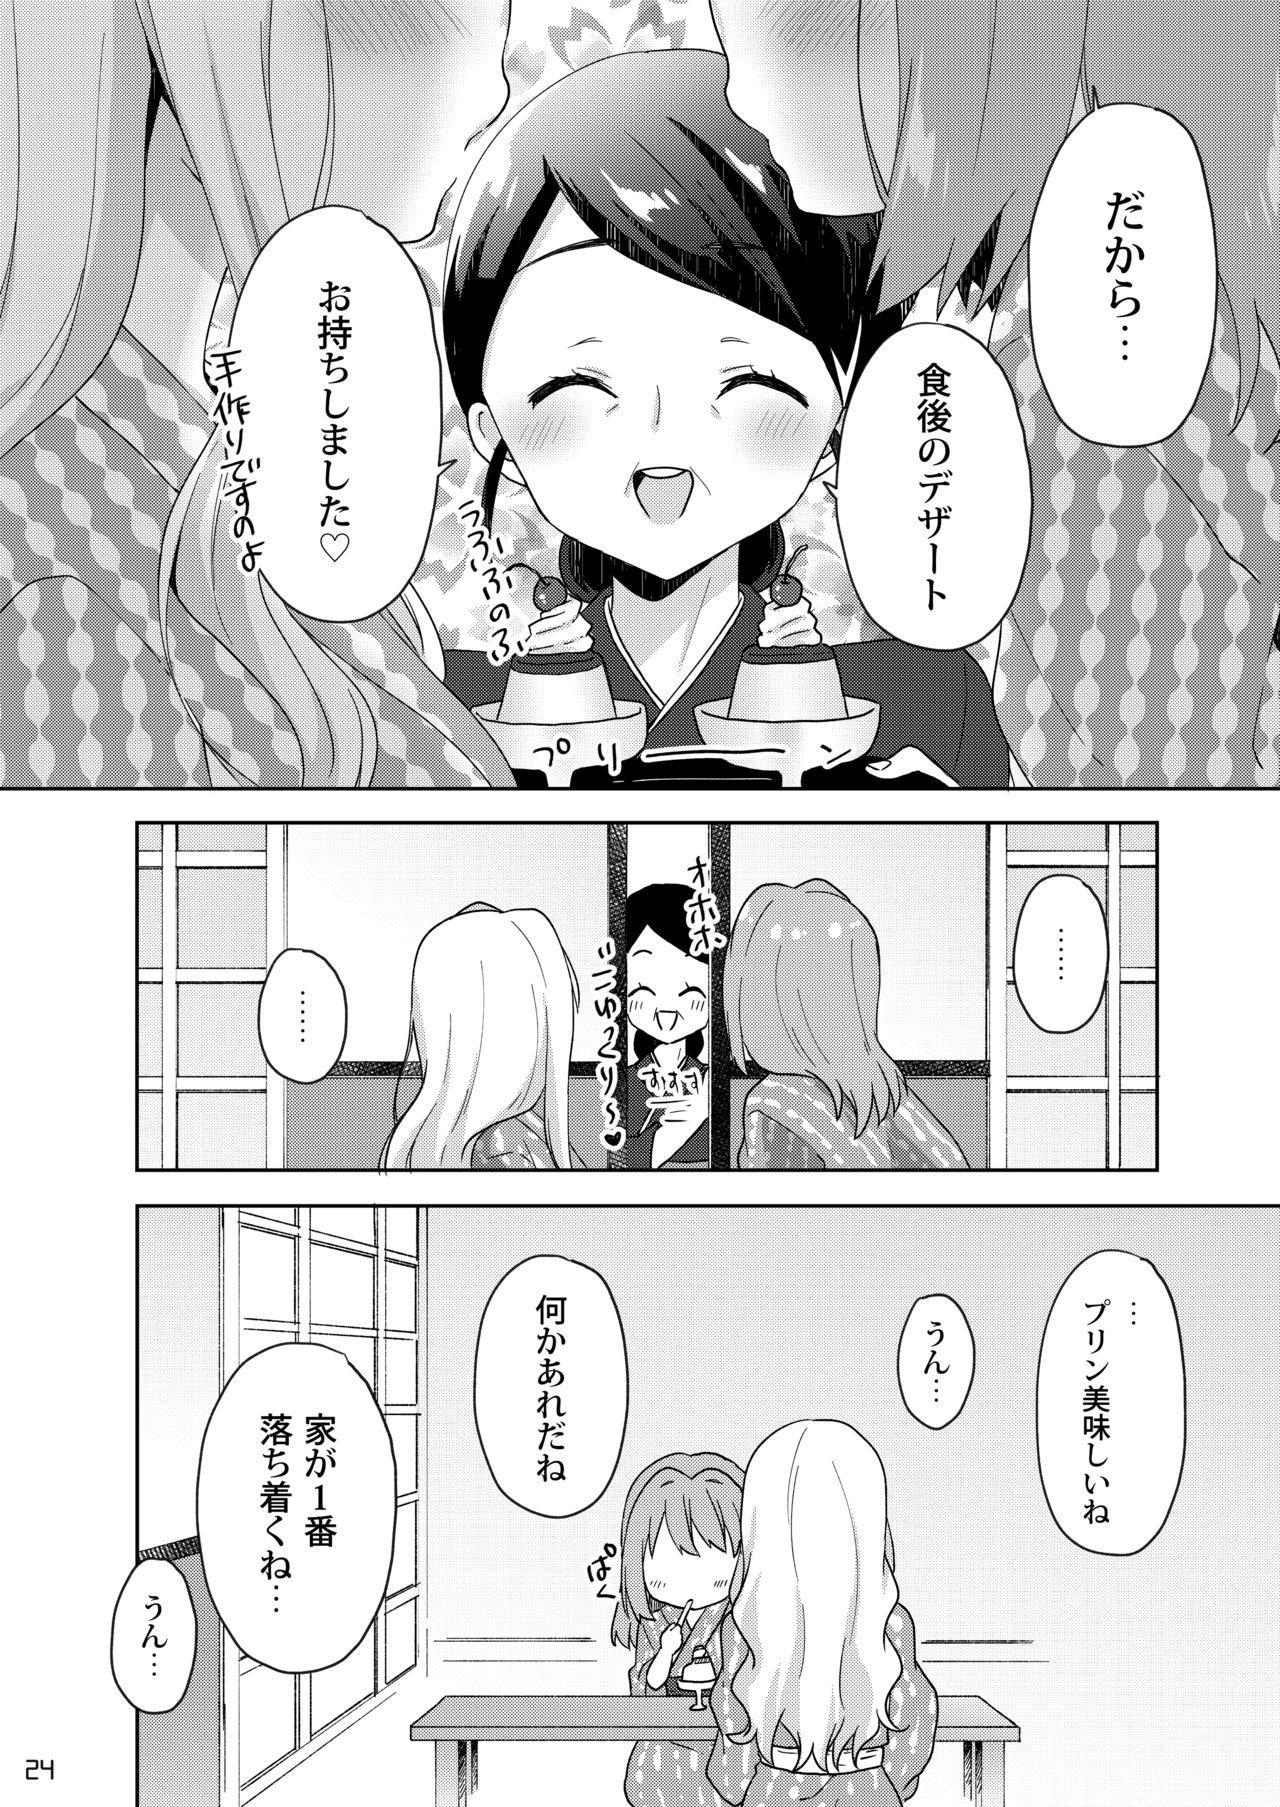 Kinyoubi no Otanoshimi 22